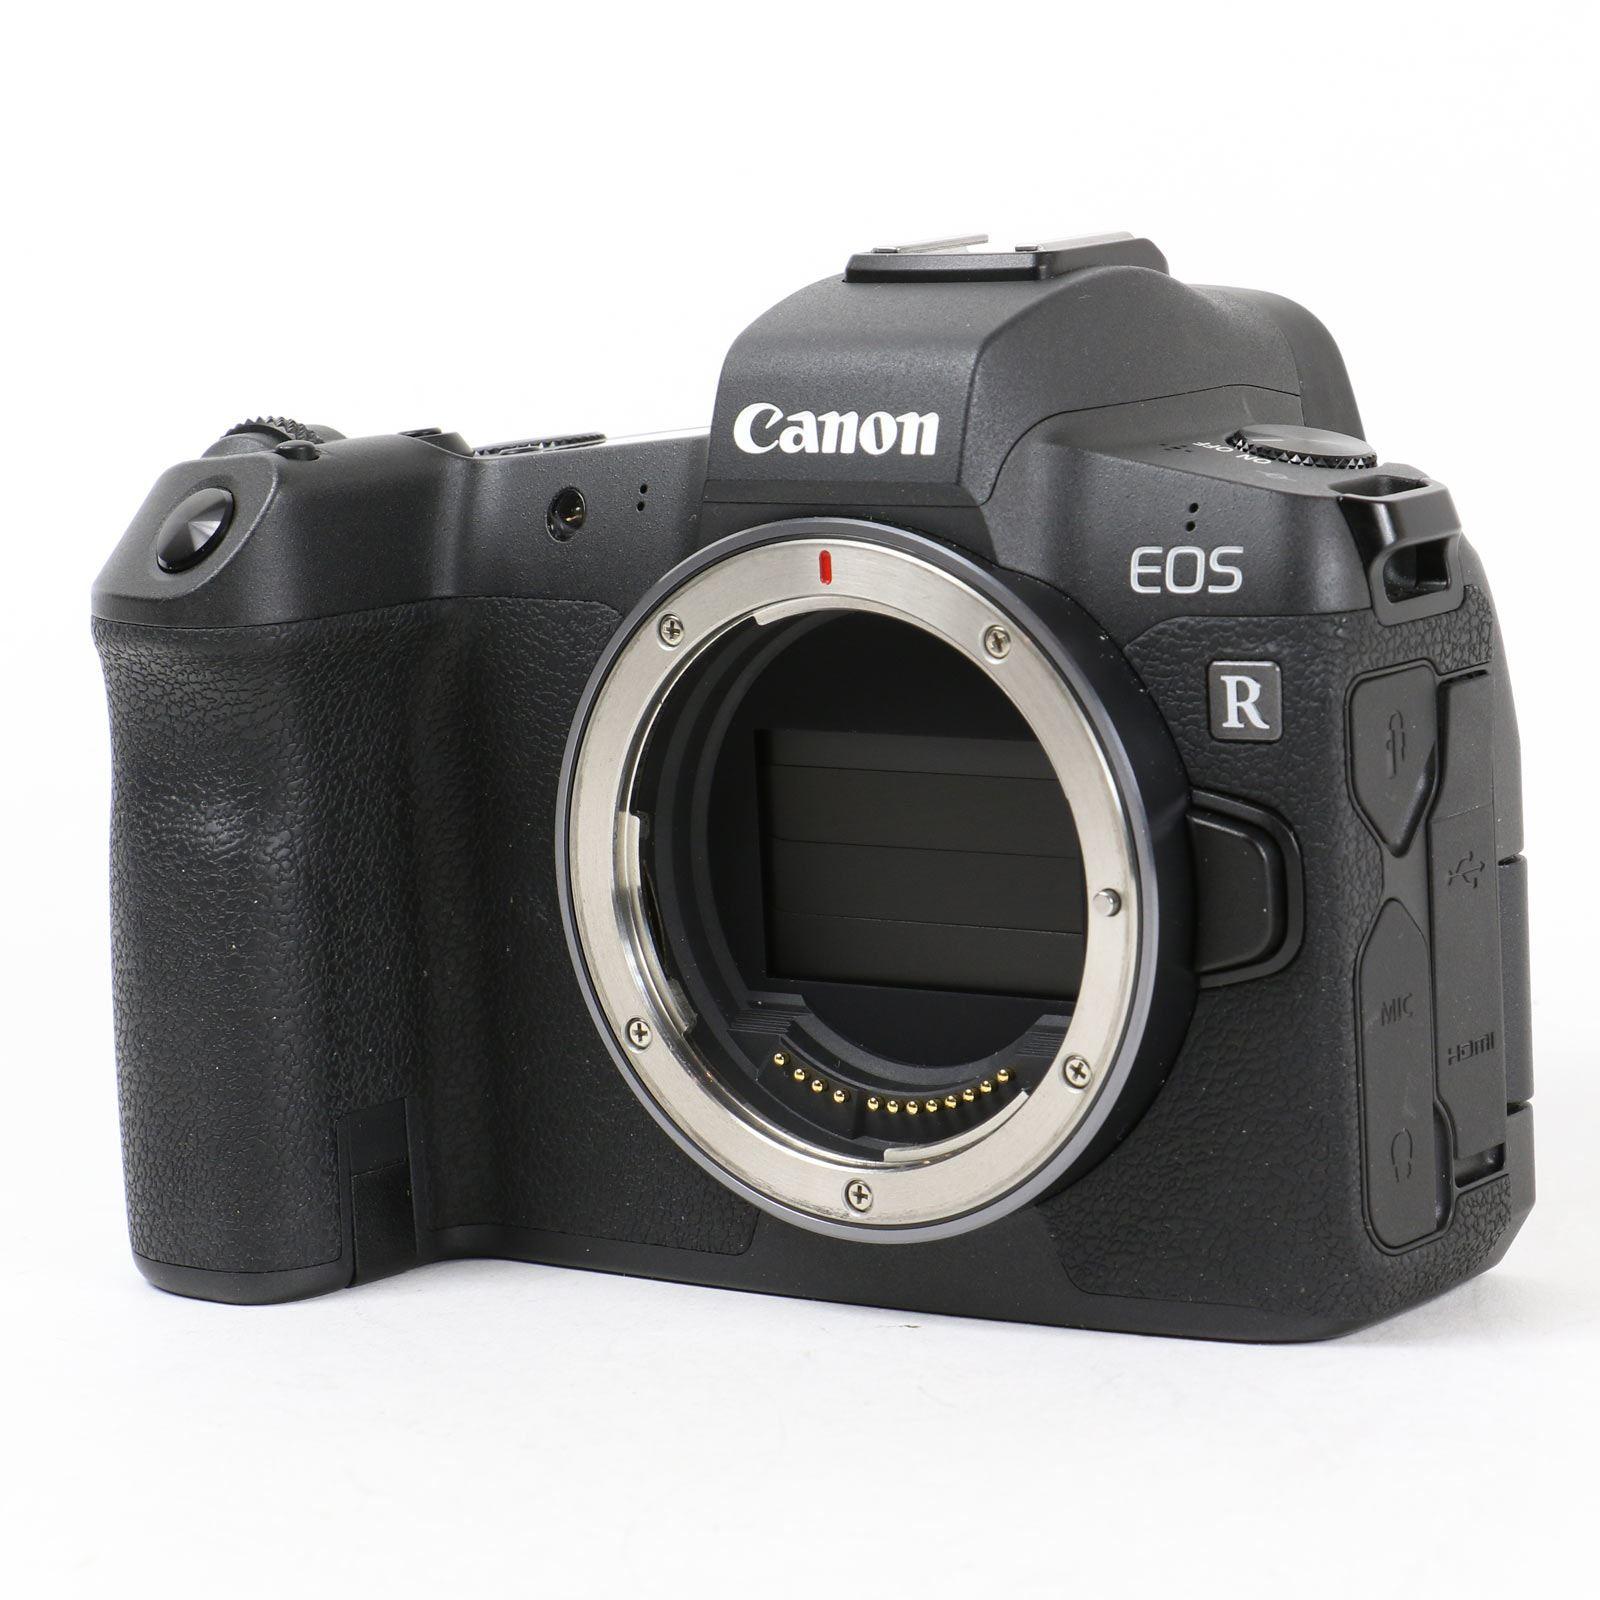 Image of Used Canon EOS R Digital Camera Body